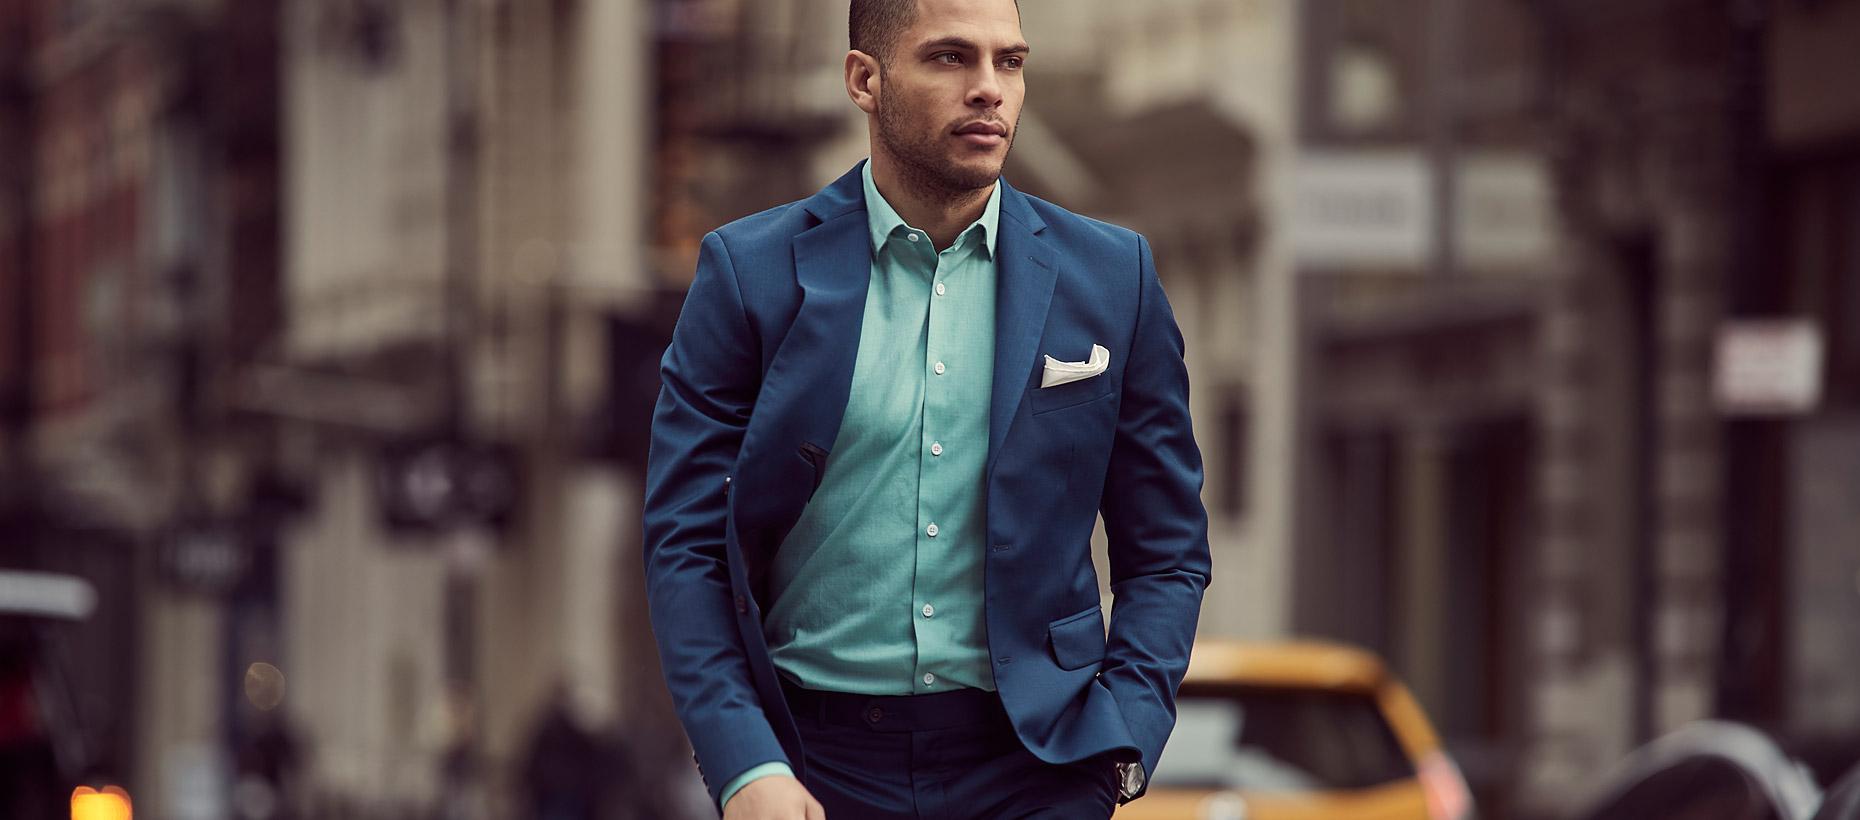 Tailor Store foto - Bravissimo